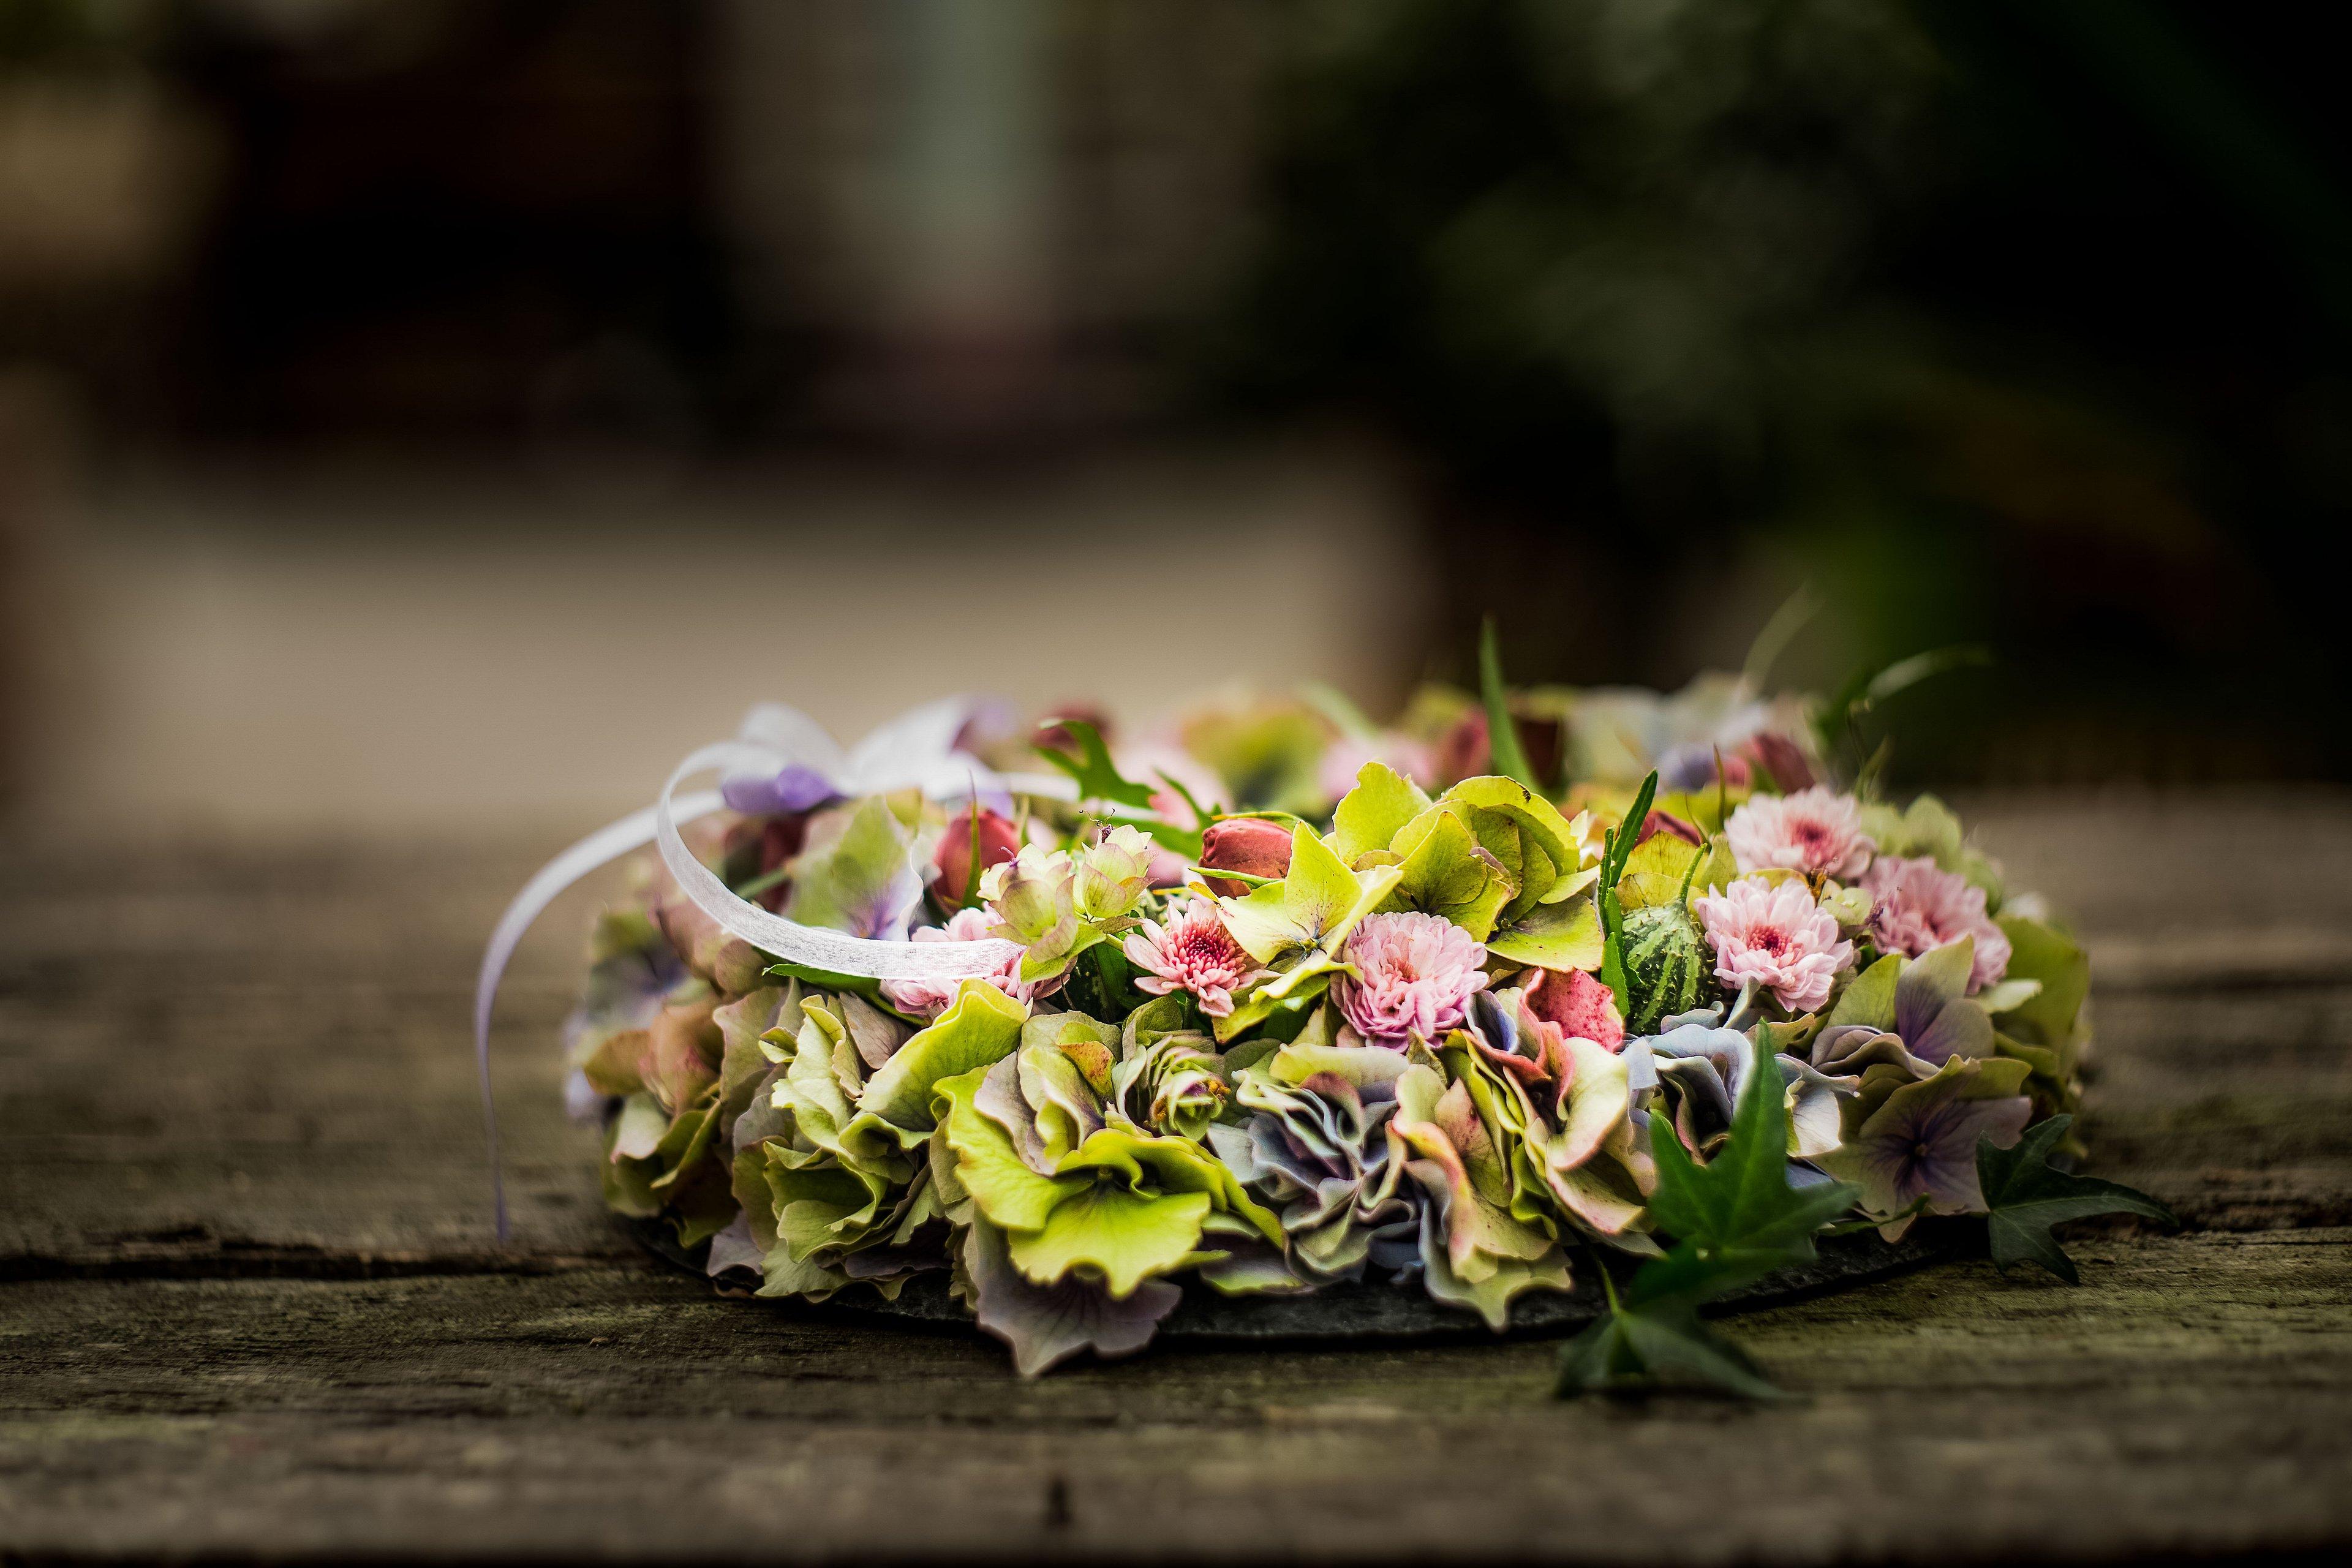 Wanninger Blumen Gärtnerei